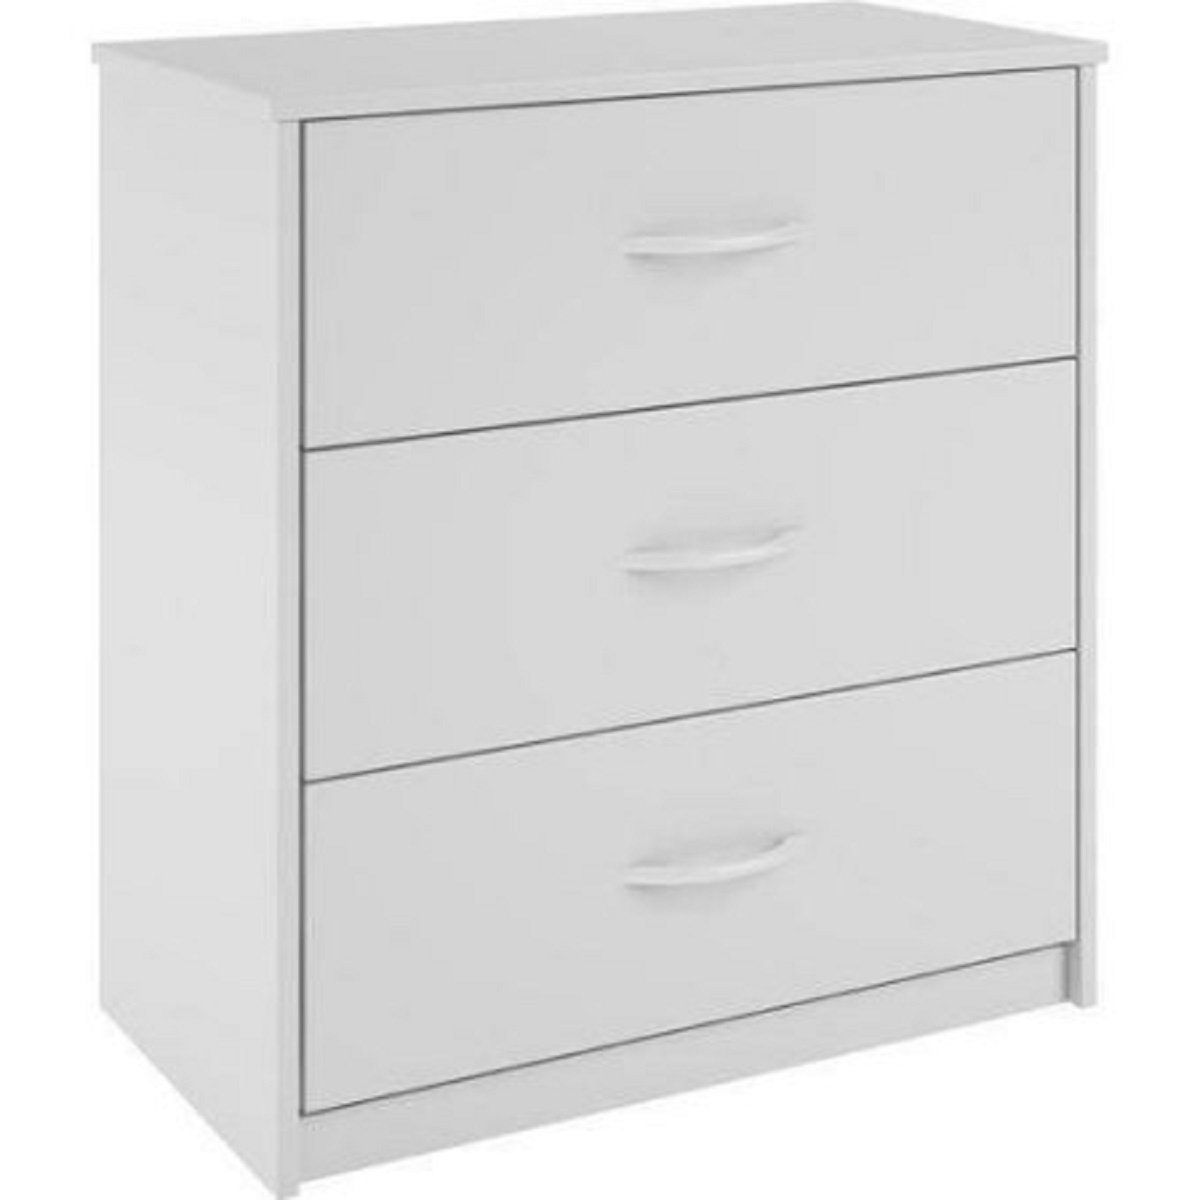 Mainstays 3-Drawer Dresser 3 easy-glide drawers (White)